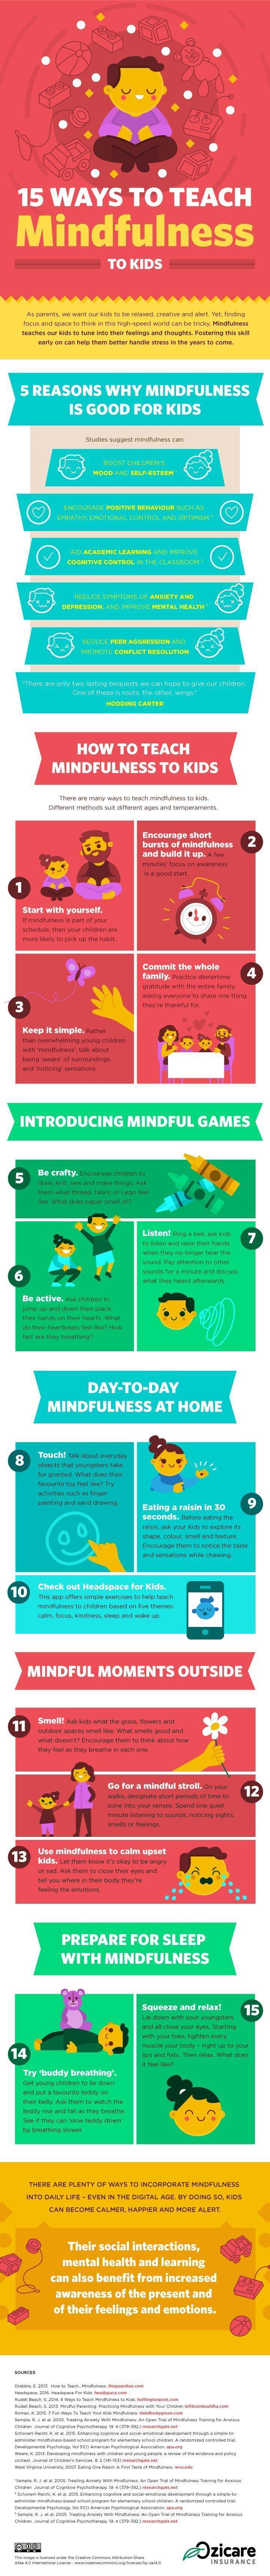 3 minute guided meditation script